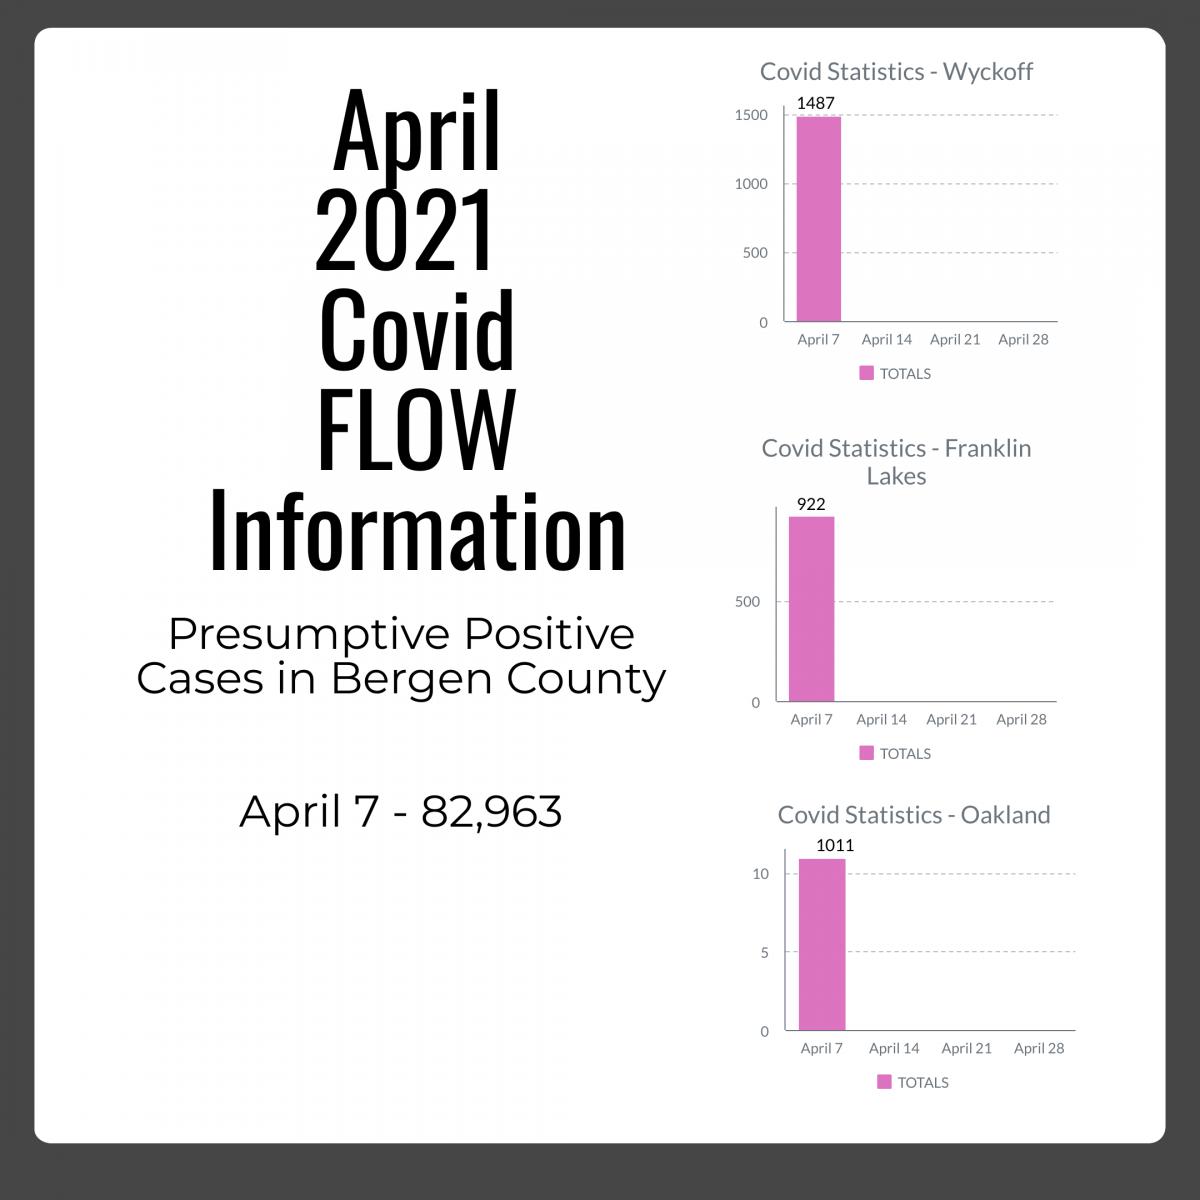 April 7th FLOW Covid Info